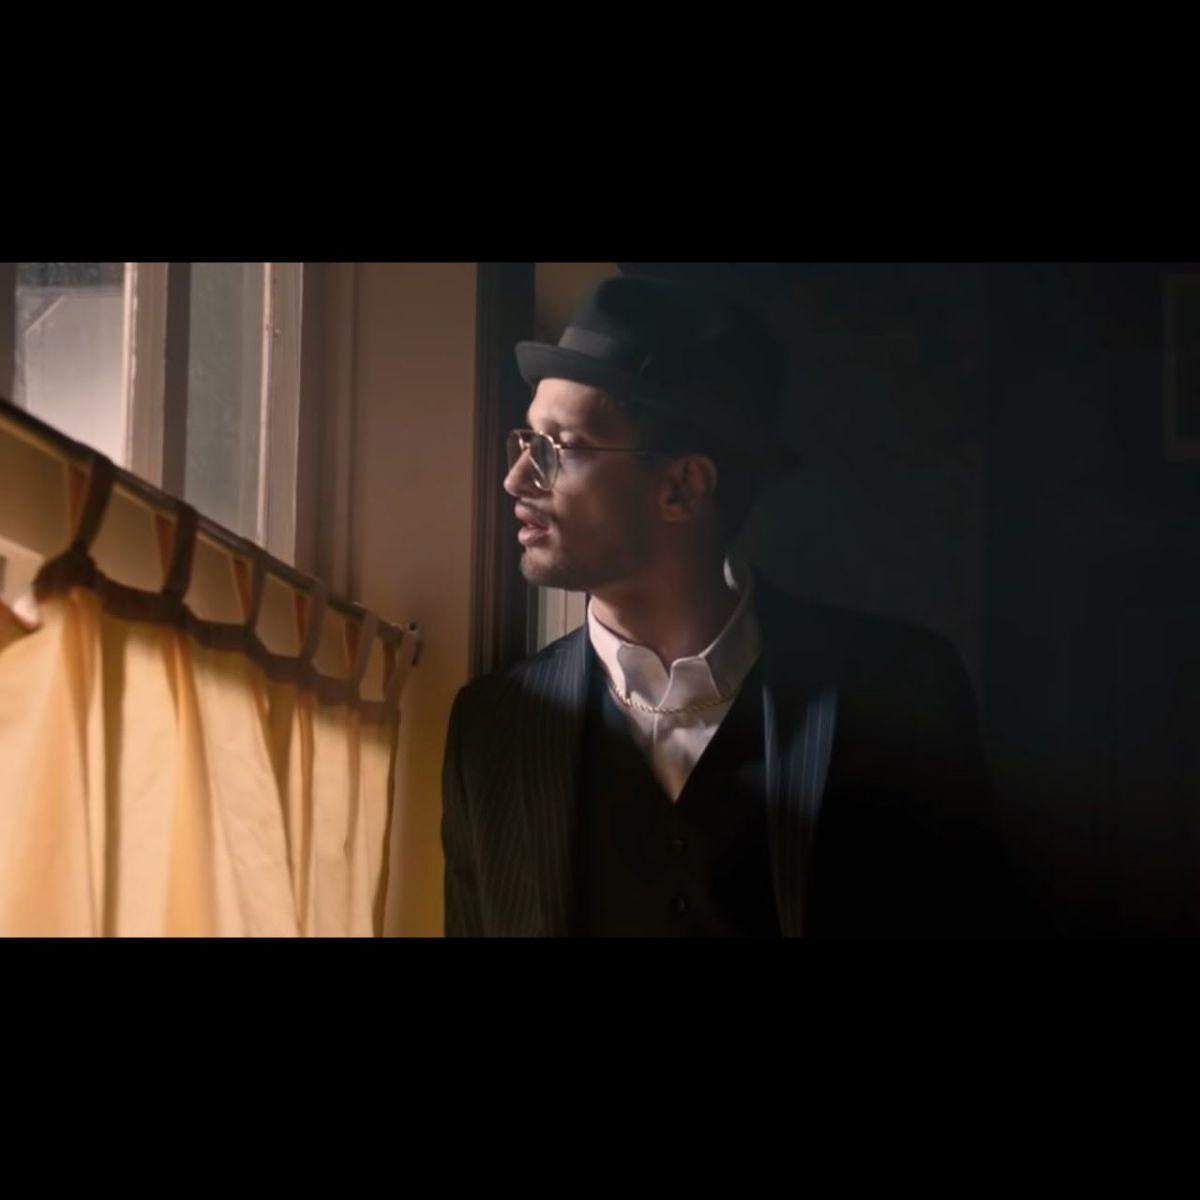 Soolking - Ça fait des années (ft. Cheb Mami) (Thumbnail)